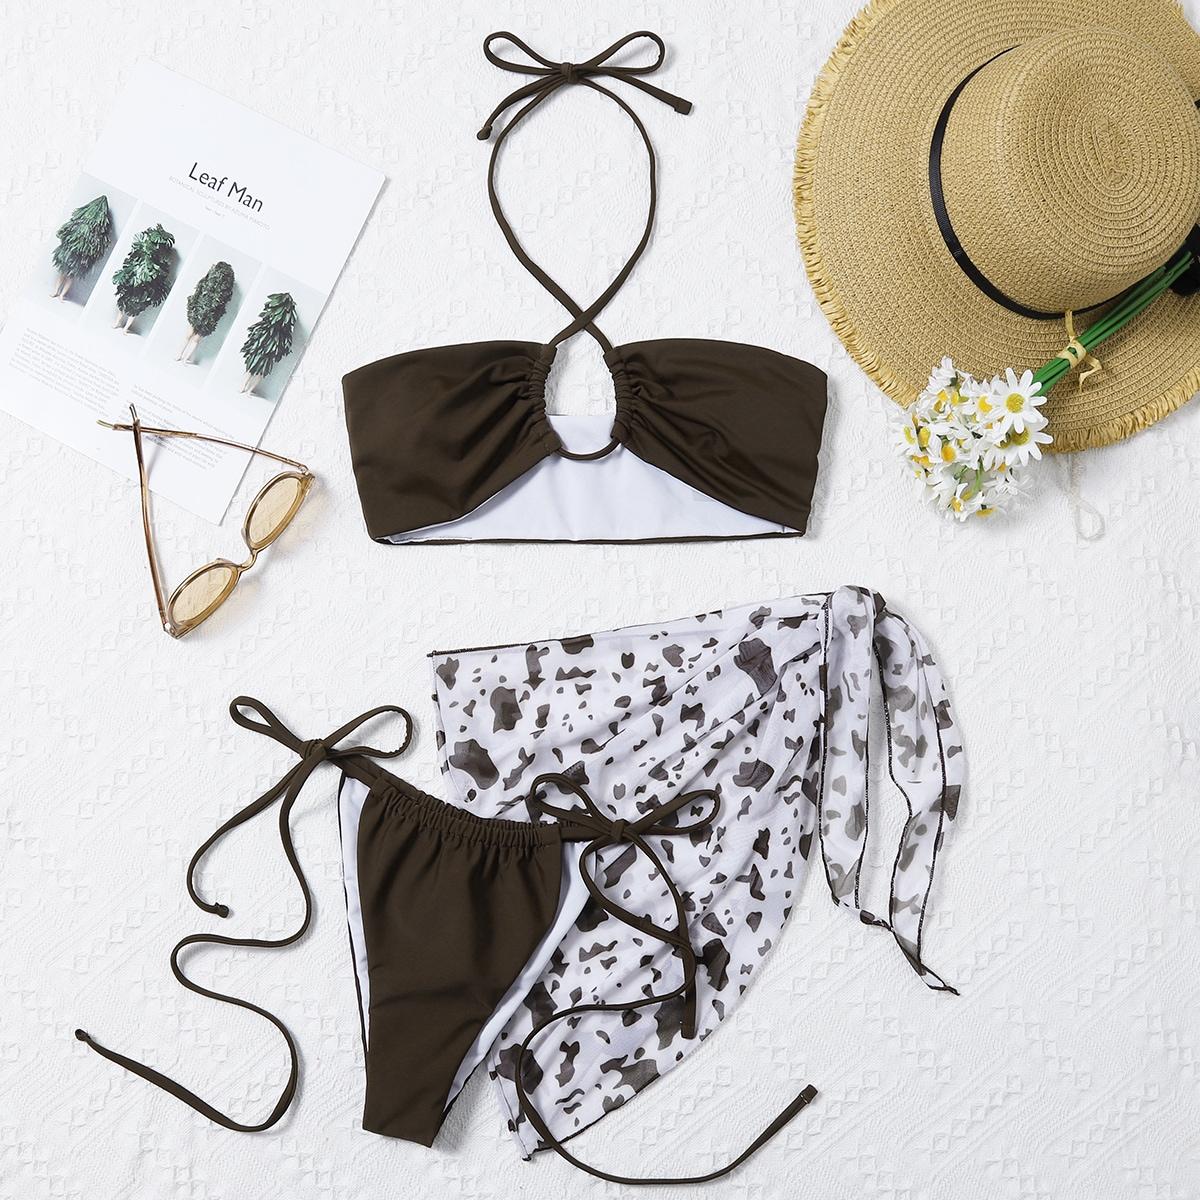 SHEIN / 3pack Cross Halter Bikini Swimsuit & Beach Skirt